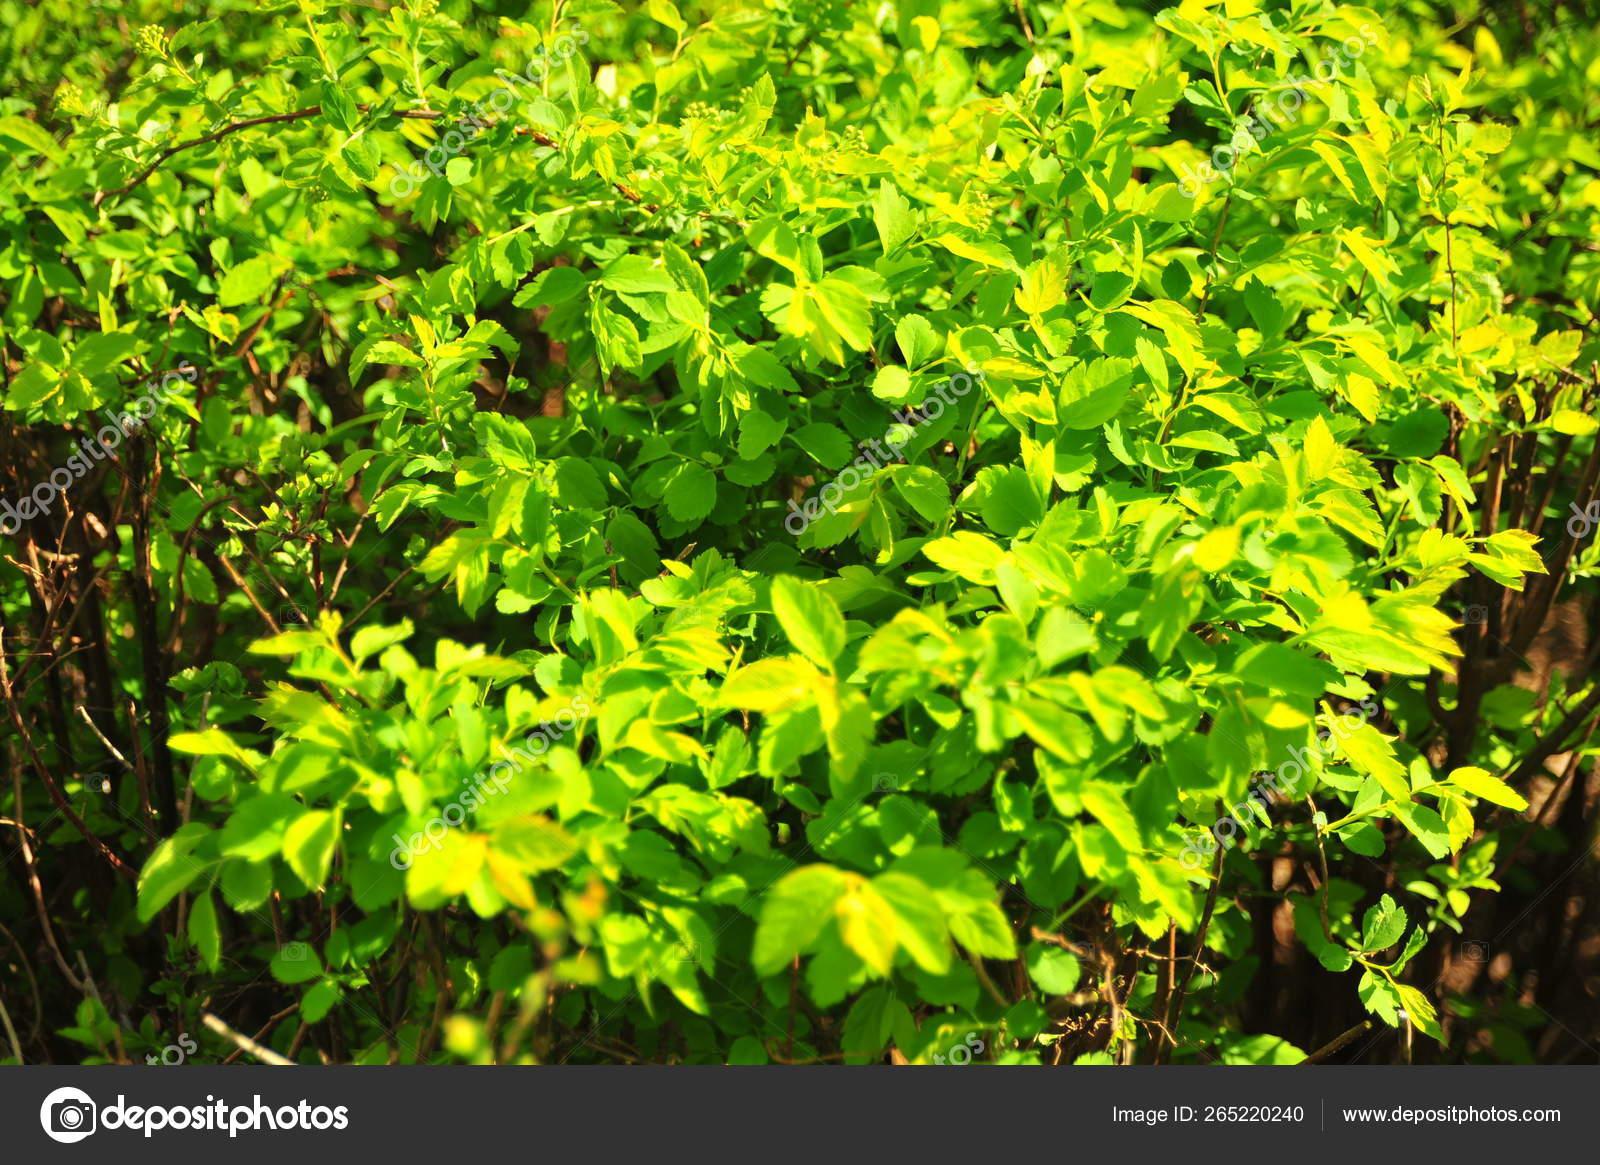 Bright Green Shrub Leaves Spring Nature Summer Outdoor Green Bush Stock Photo Image By C Olga Sunandmoon 265220240